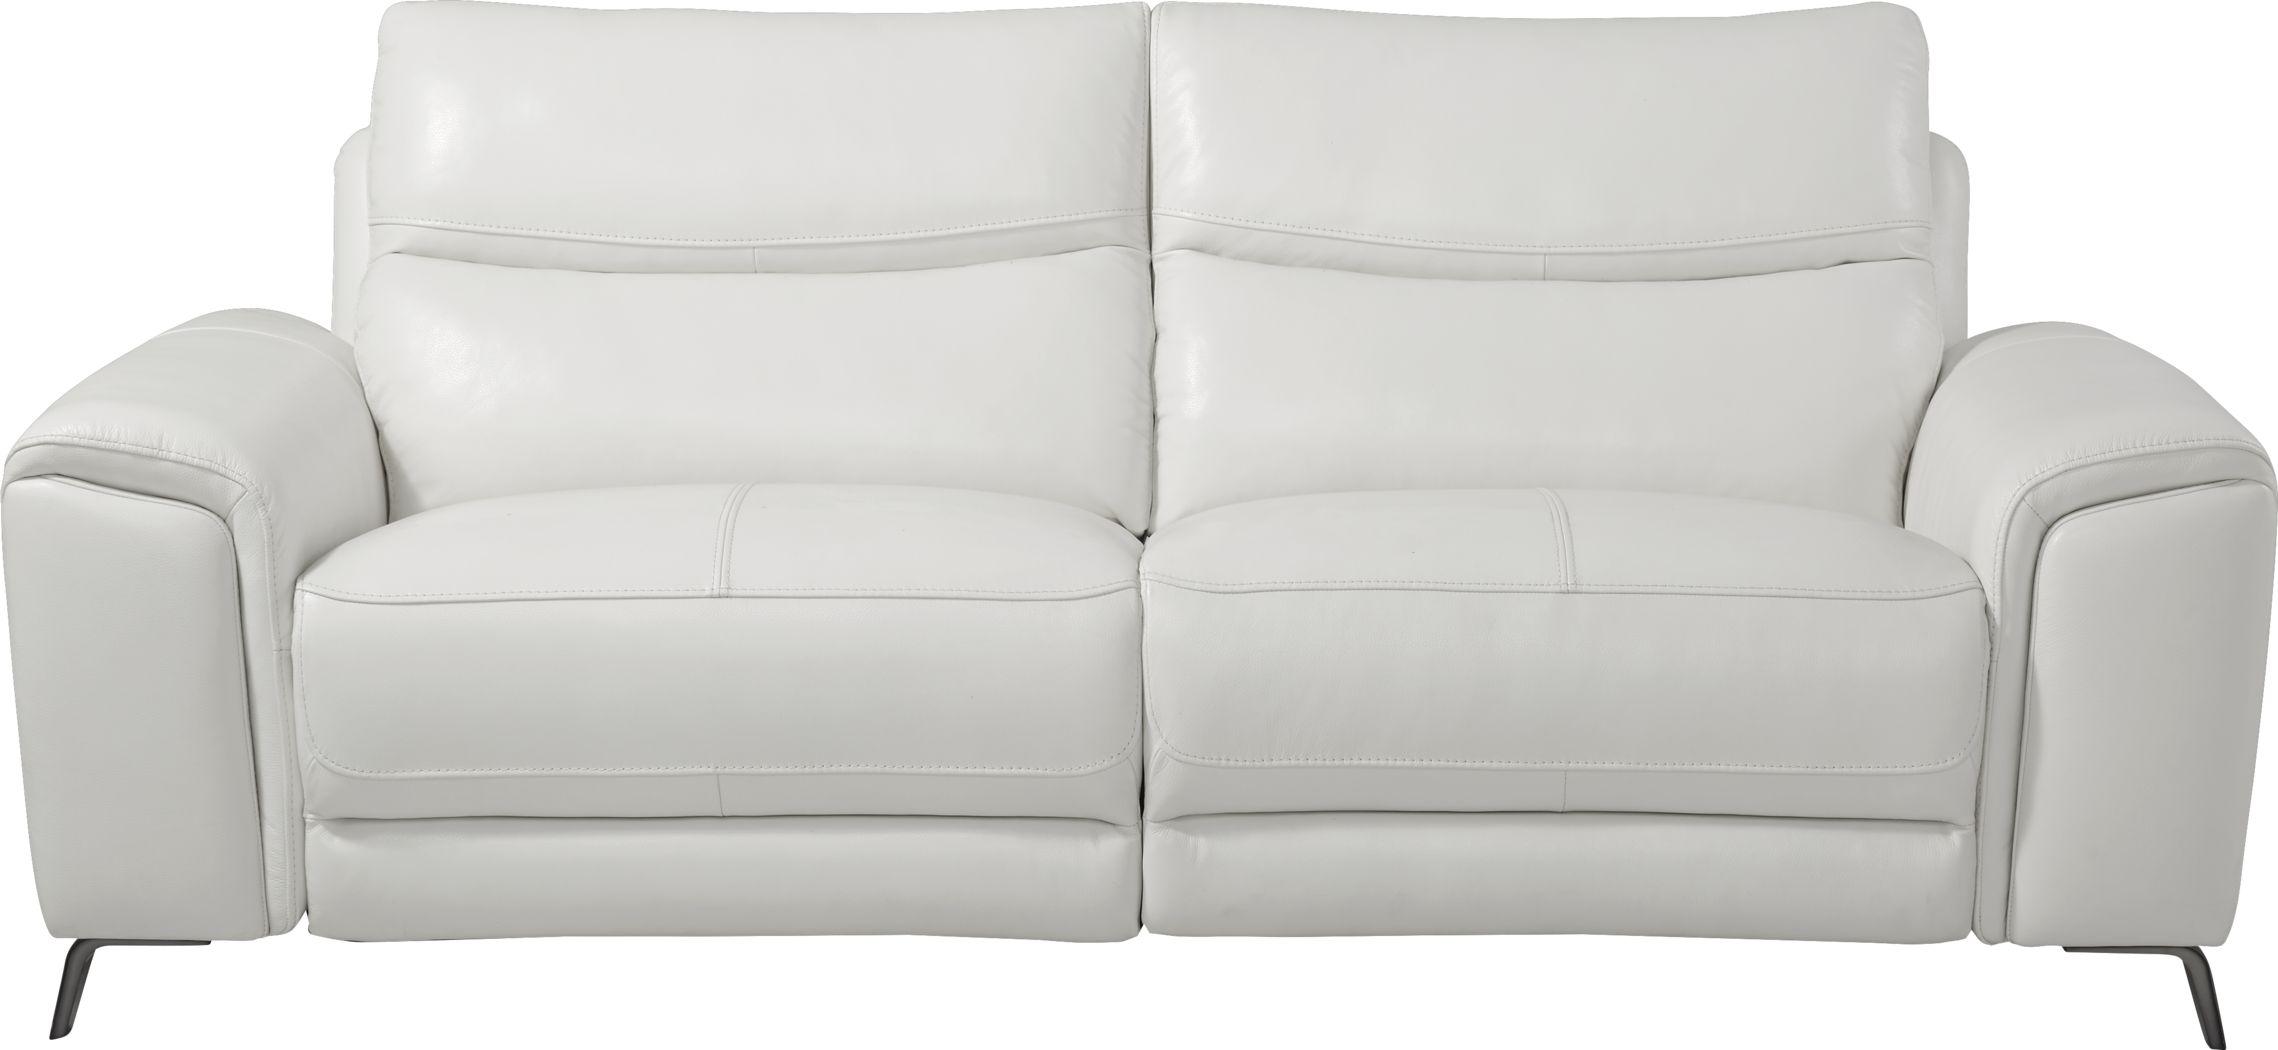 Rosato White Leather Power Reclining Sofa